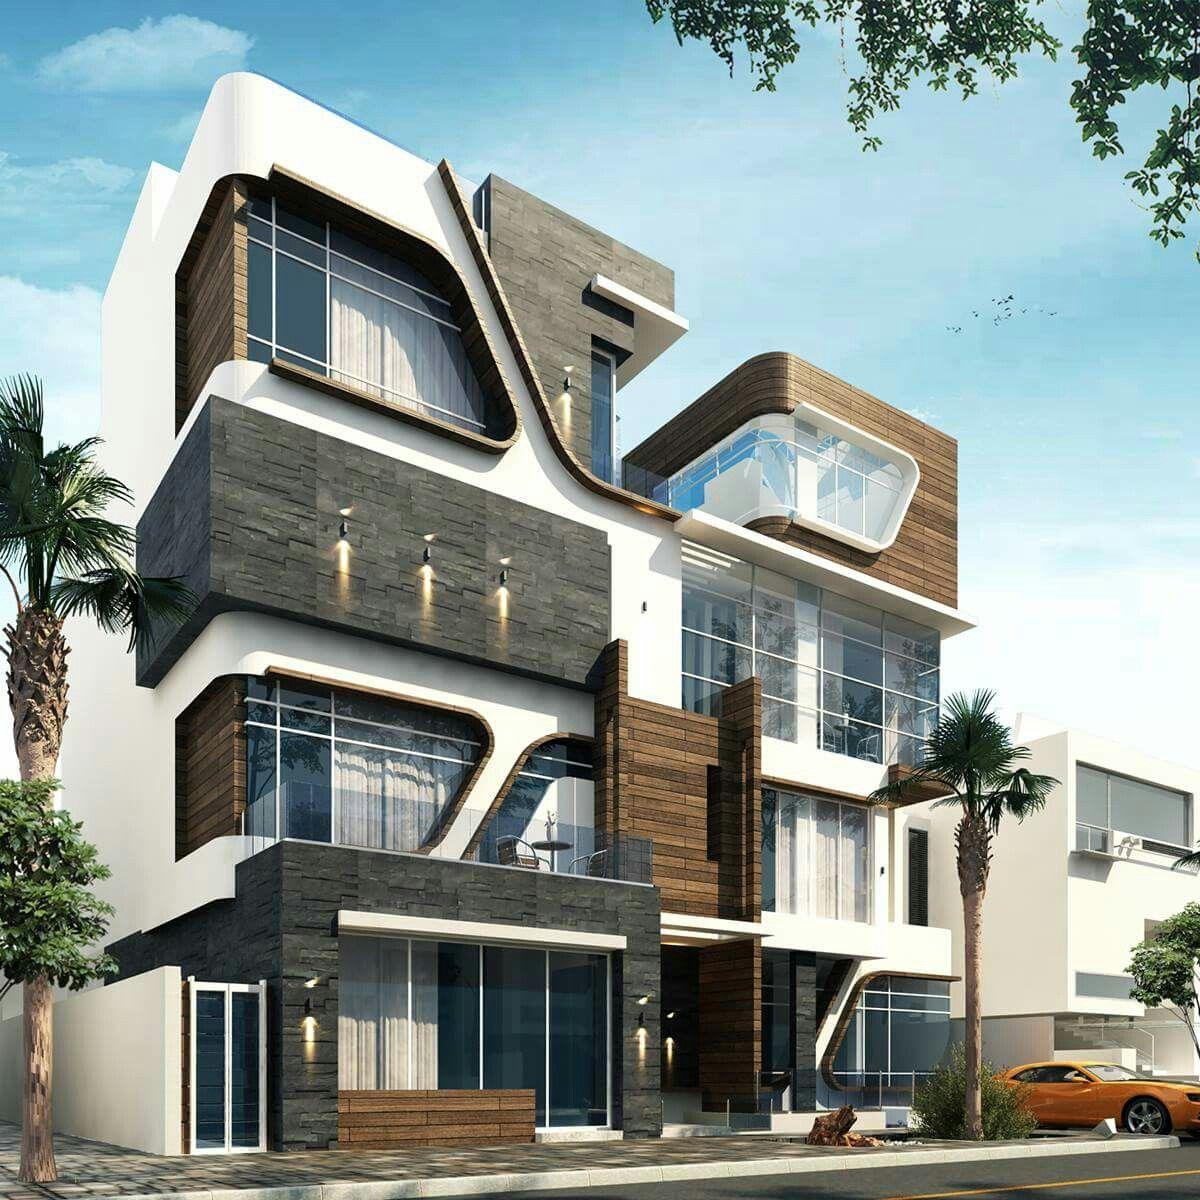 Home Design Center Missouri City Tx: Villa By Mo'men Gamal. Software: Vray, Autodesk 3ds Max